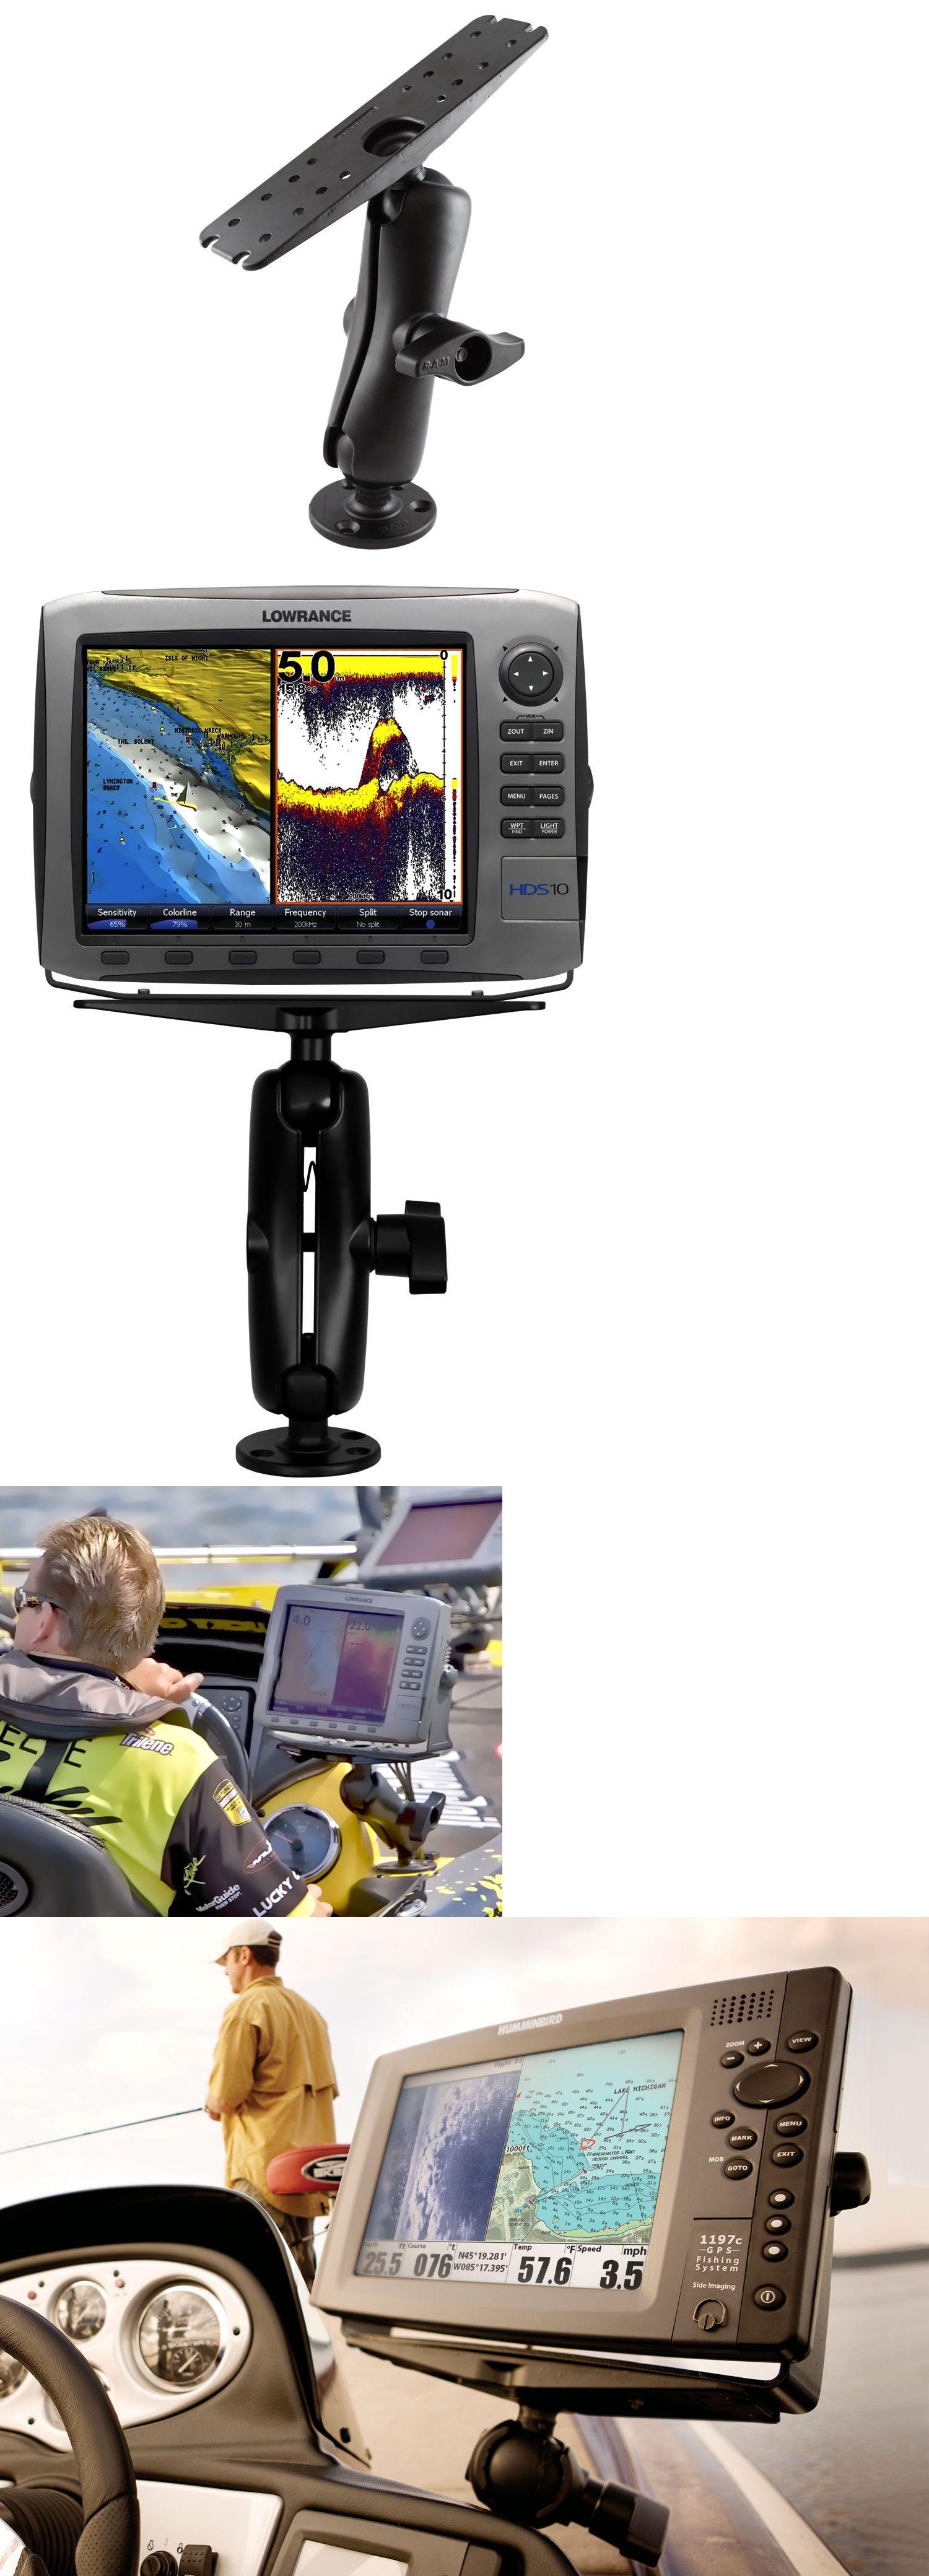 GPS Holders and Mounts Ram D 111 Mount Long For Garmin Humminbird